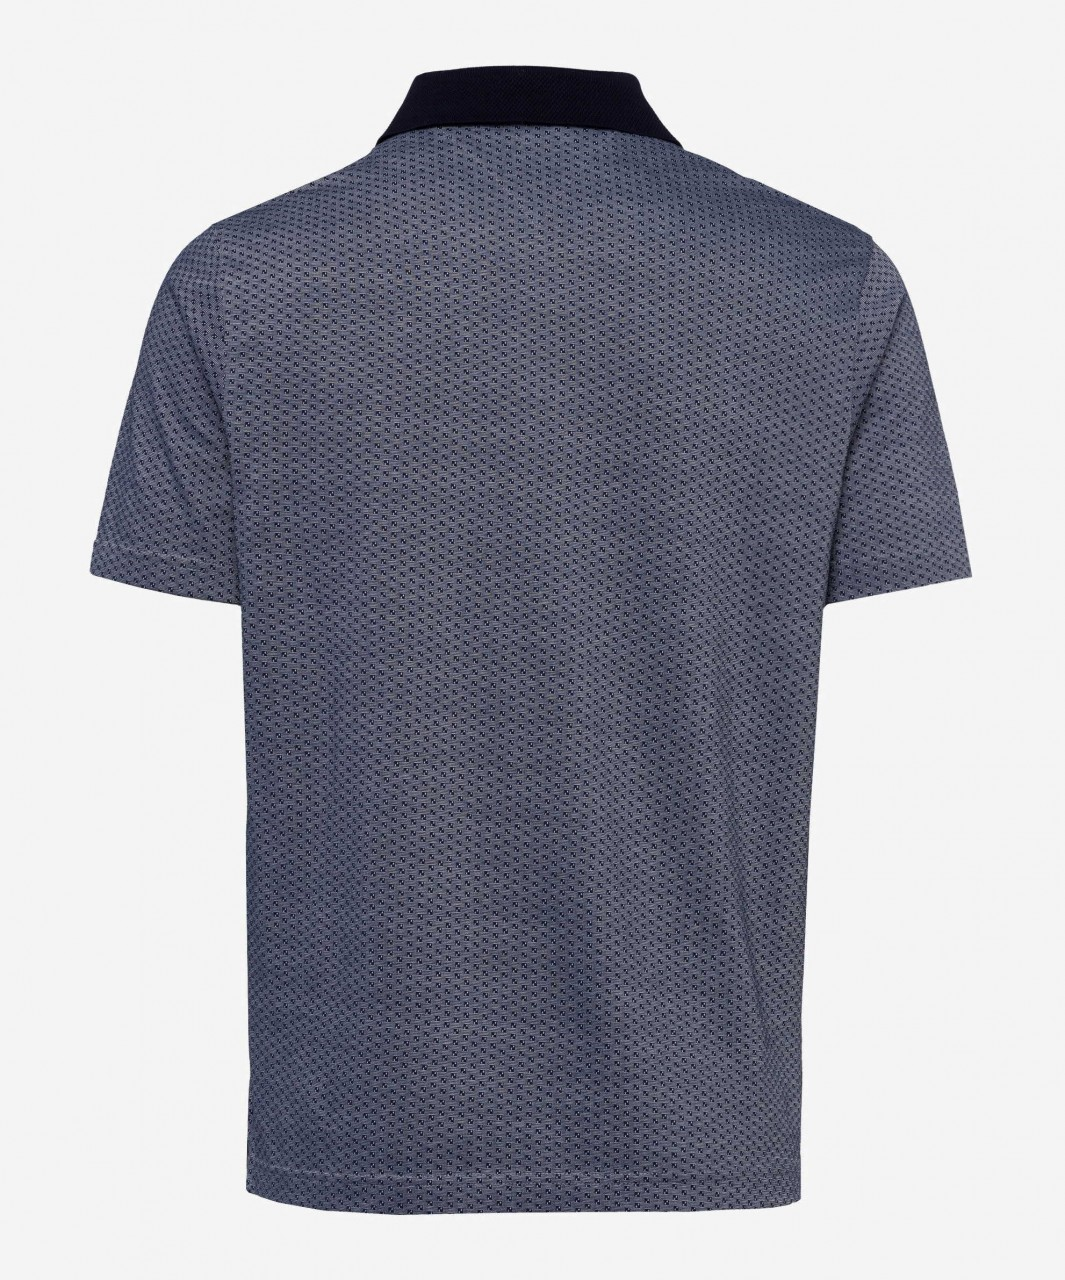 Brax Poloshirt Kurzarm Männer 24-4787/23 70438300 Blau